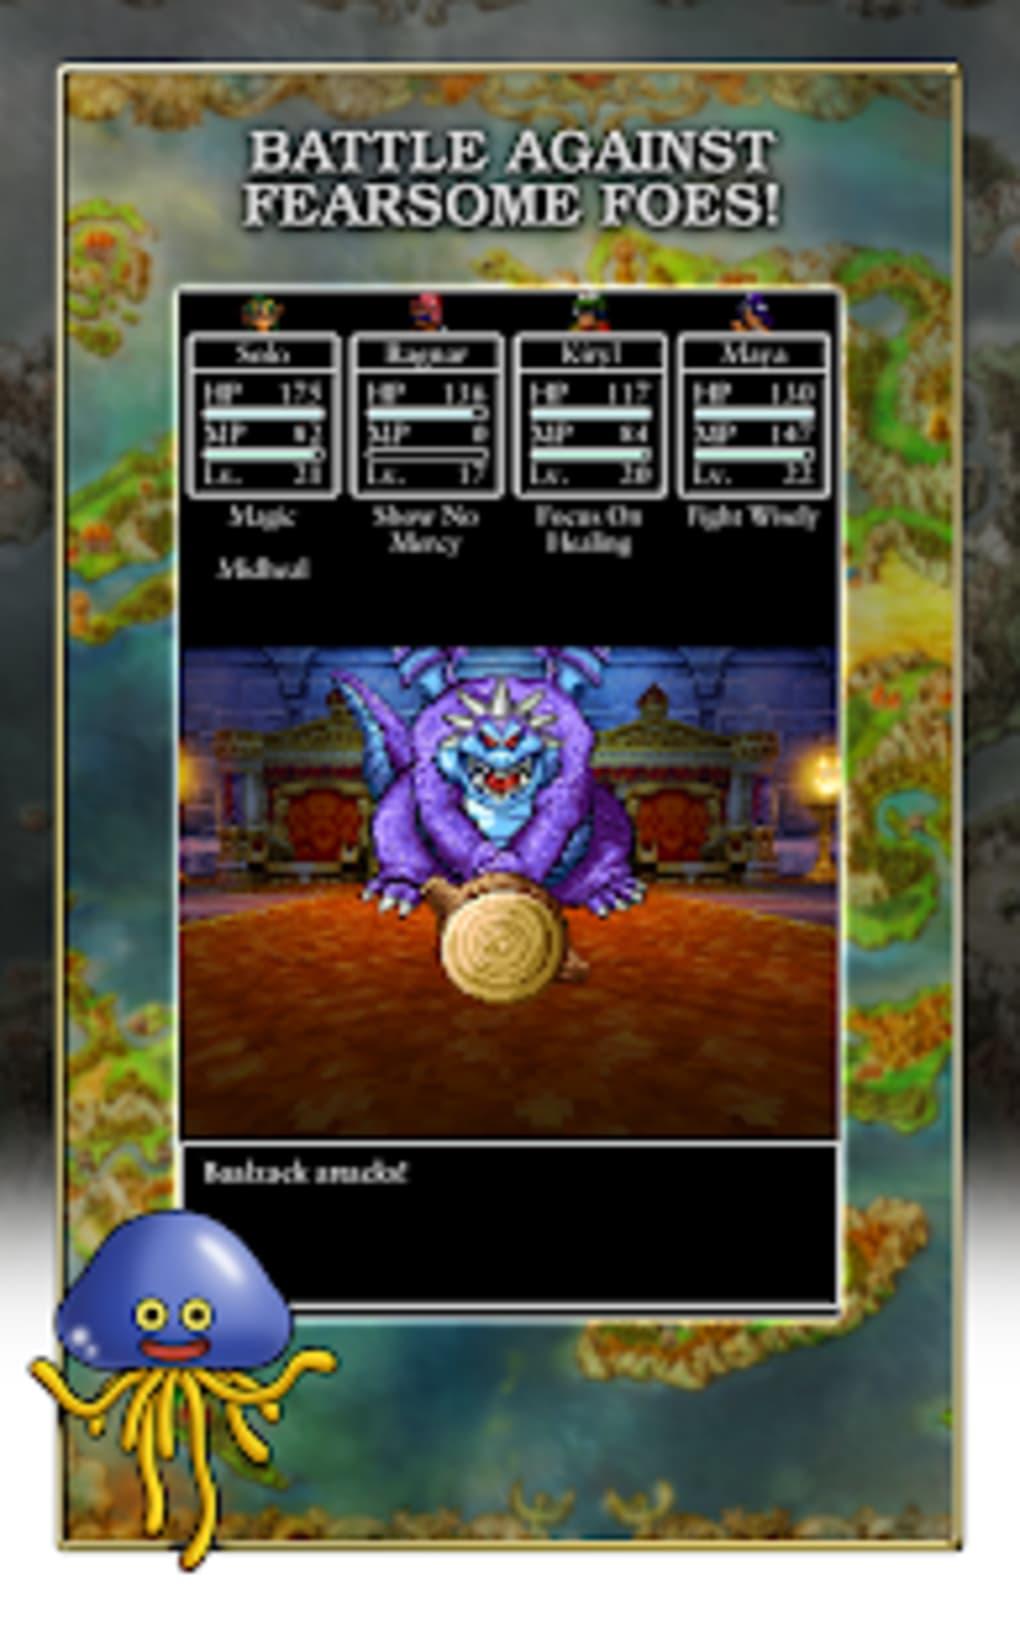 dragon quest 2 1.0.5 apk